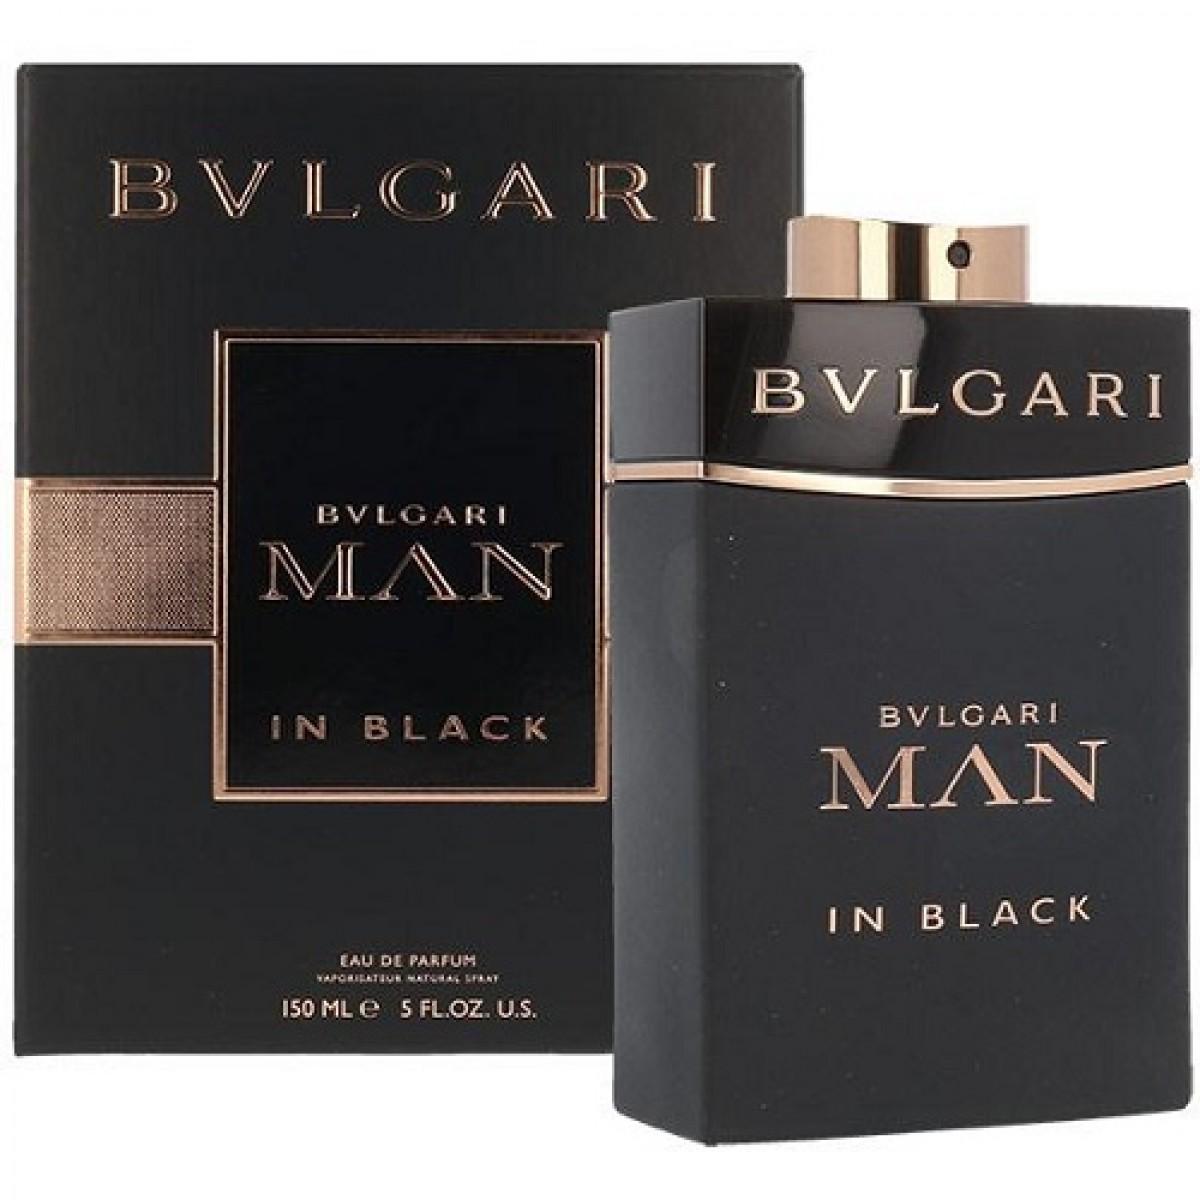 Bvlgari Man In Black (M) EDP/S 150ML Vīriešu Smaržas